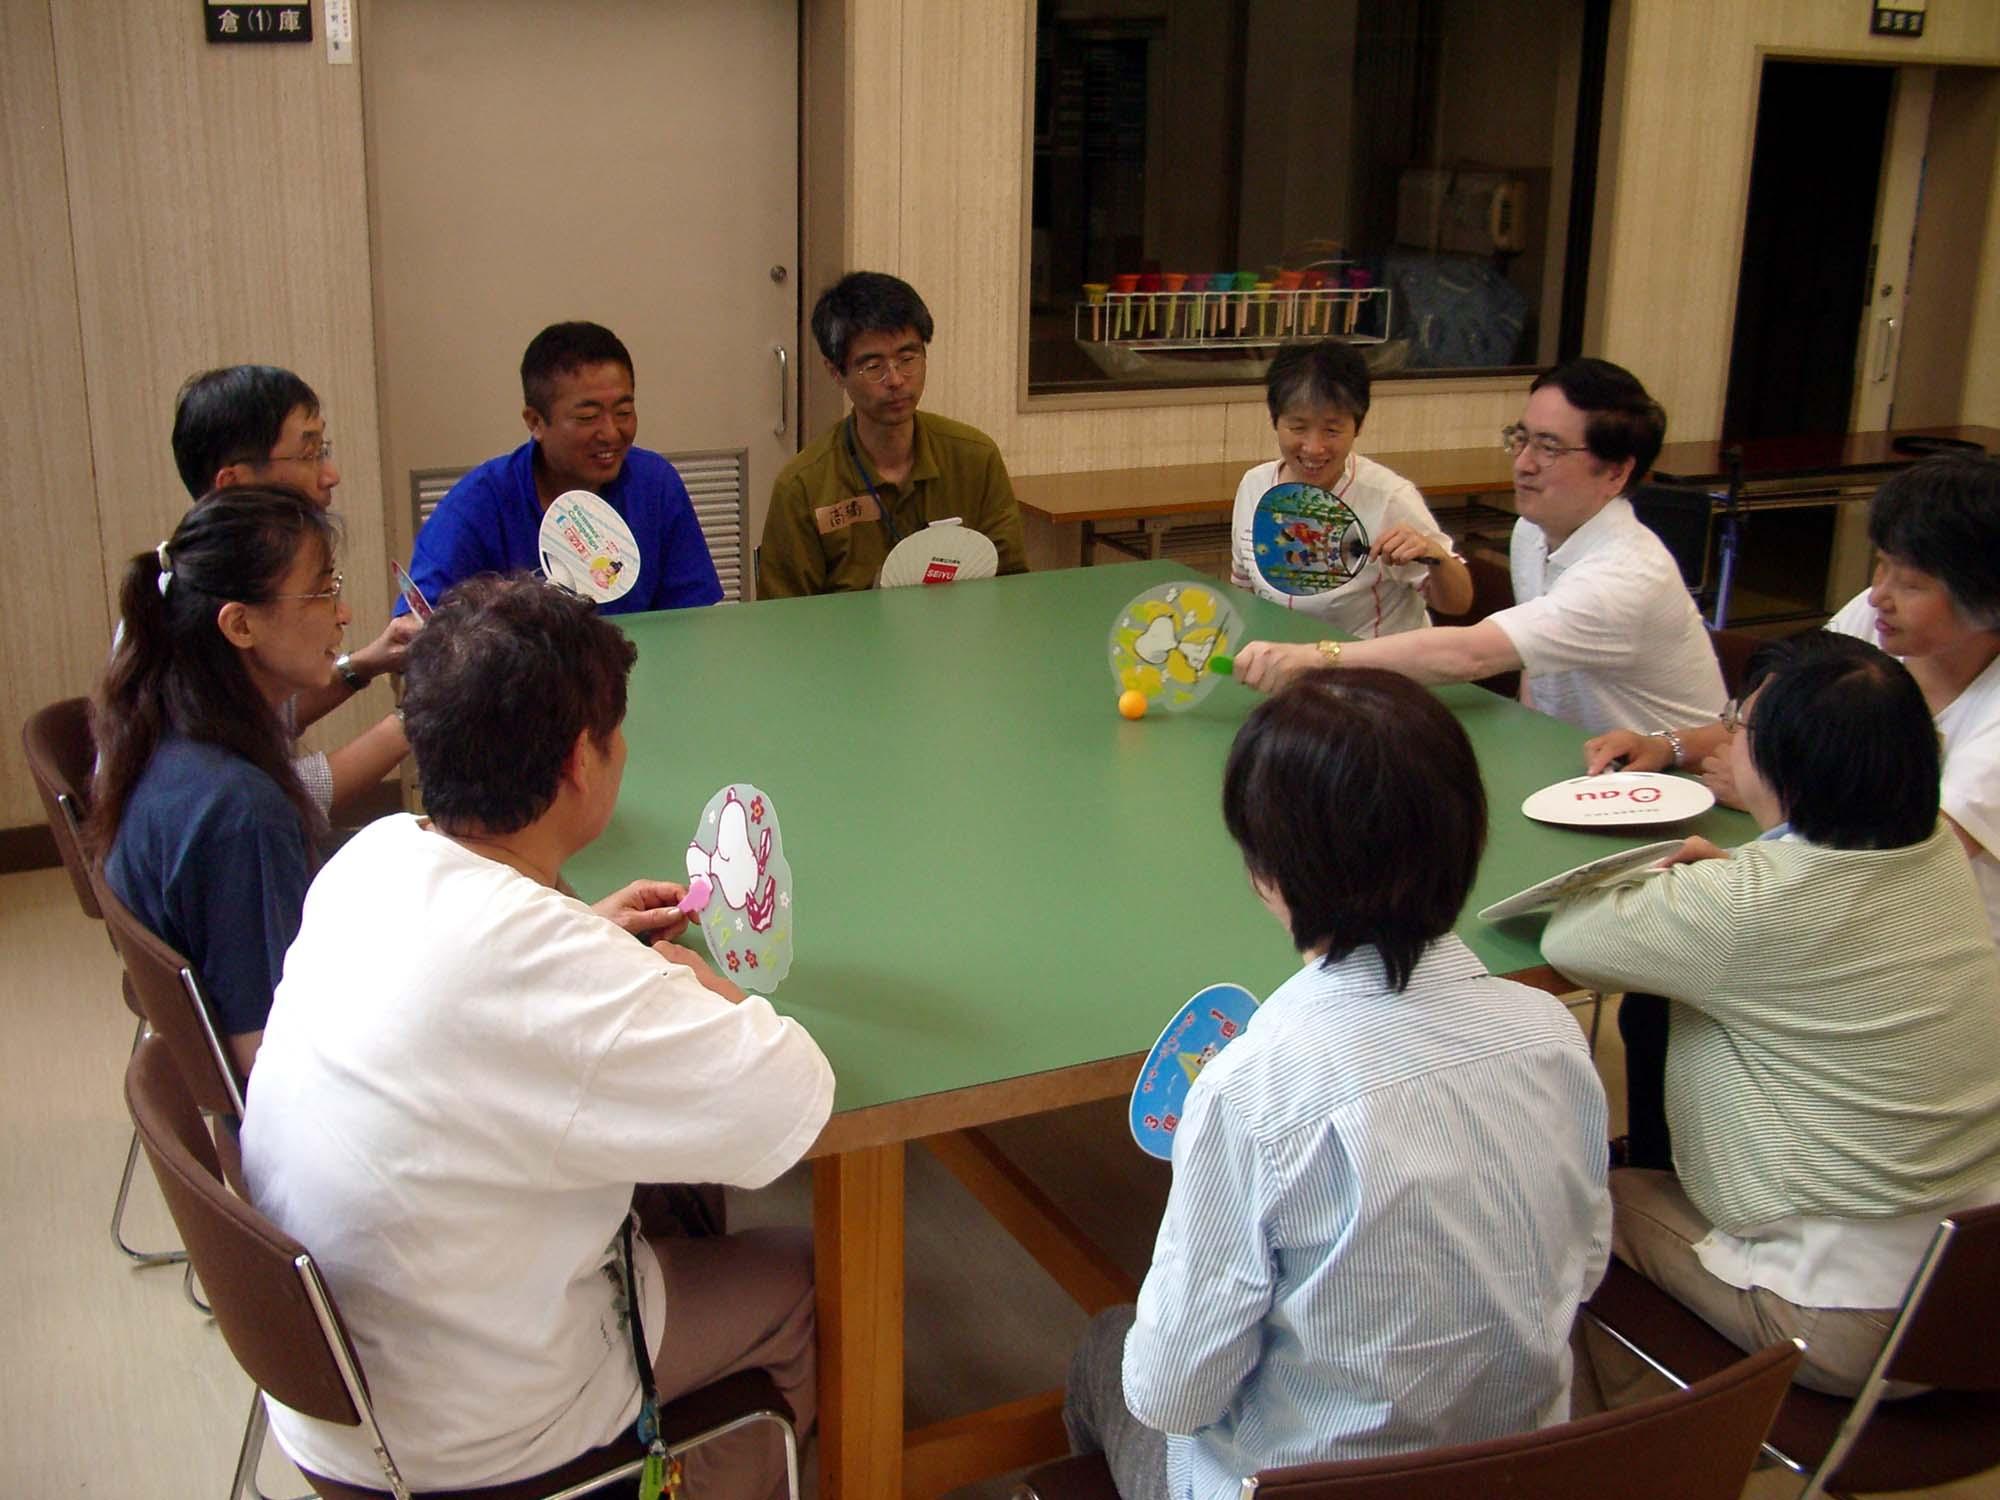 utiwa - 地域支援事業(日野市立やまばと社会交流事業)・・・日野市内の方を対象にした事業です!!